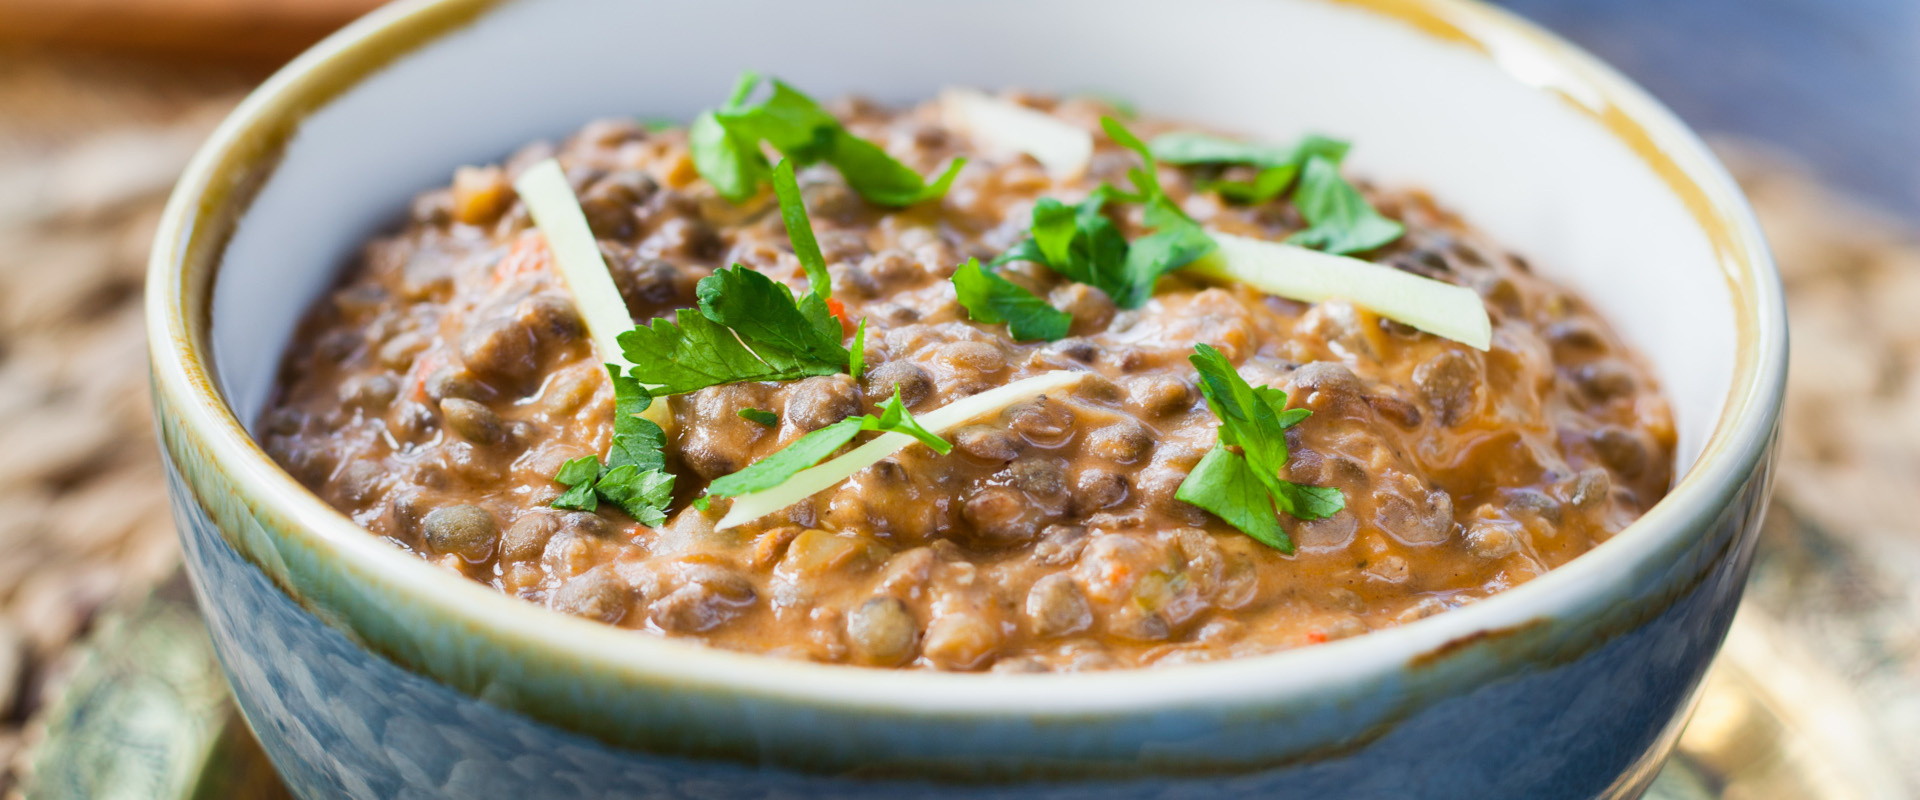 kókusztejes lencsés curry cover